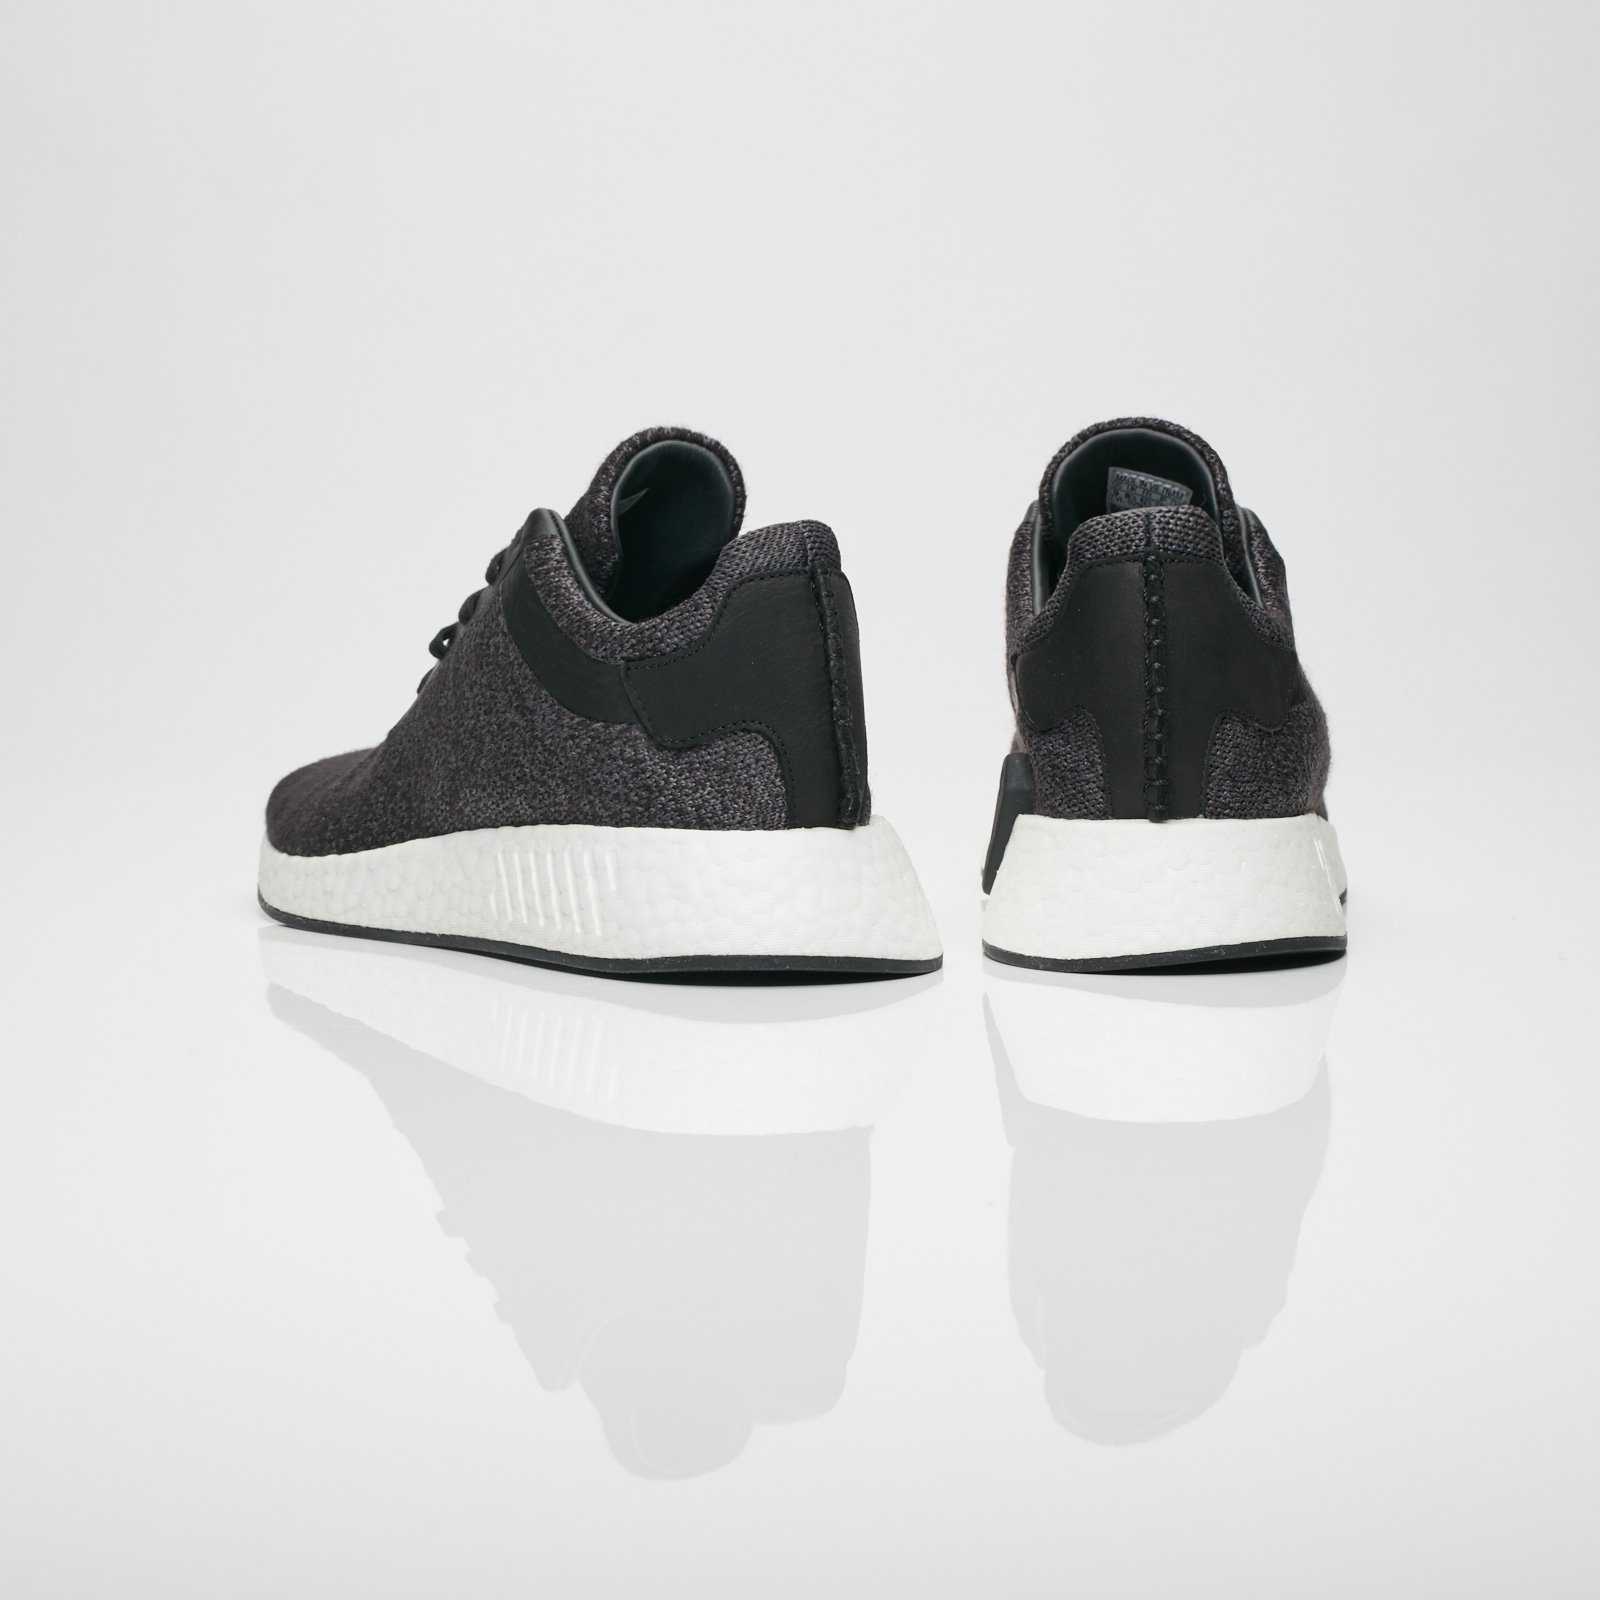 e523508702643 adidas NMD R2 PK - Cp9550 - Sneakersnstuff